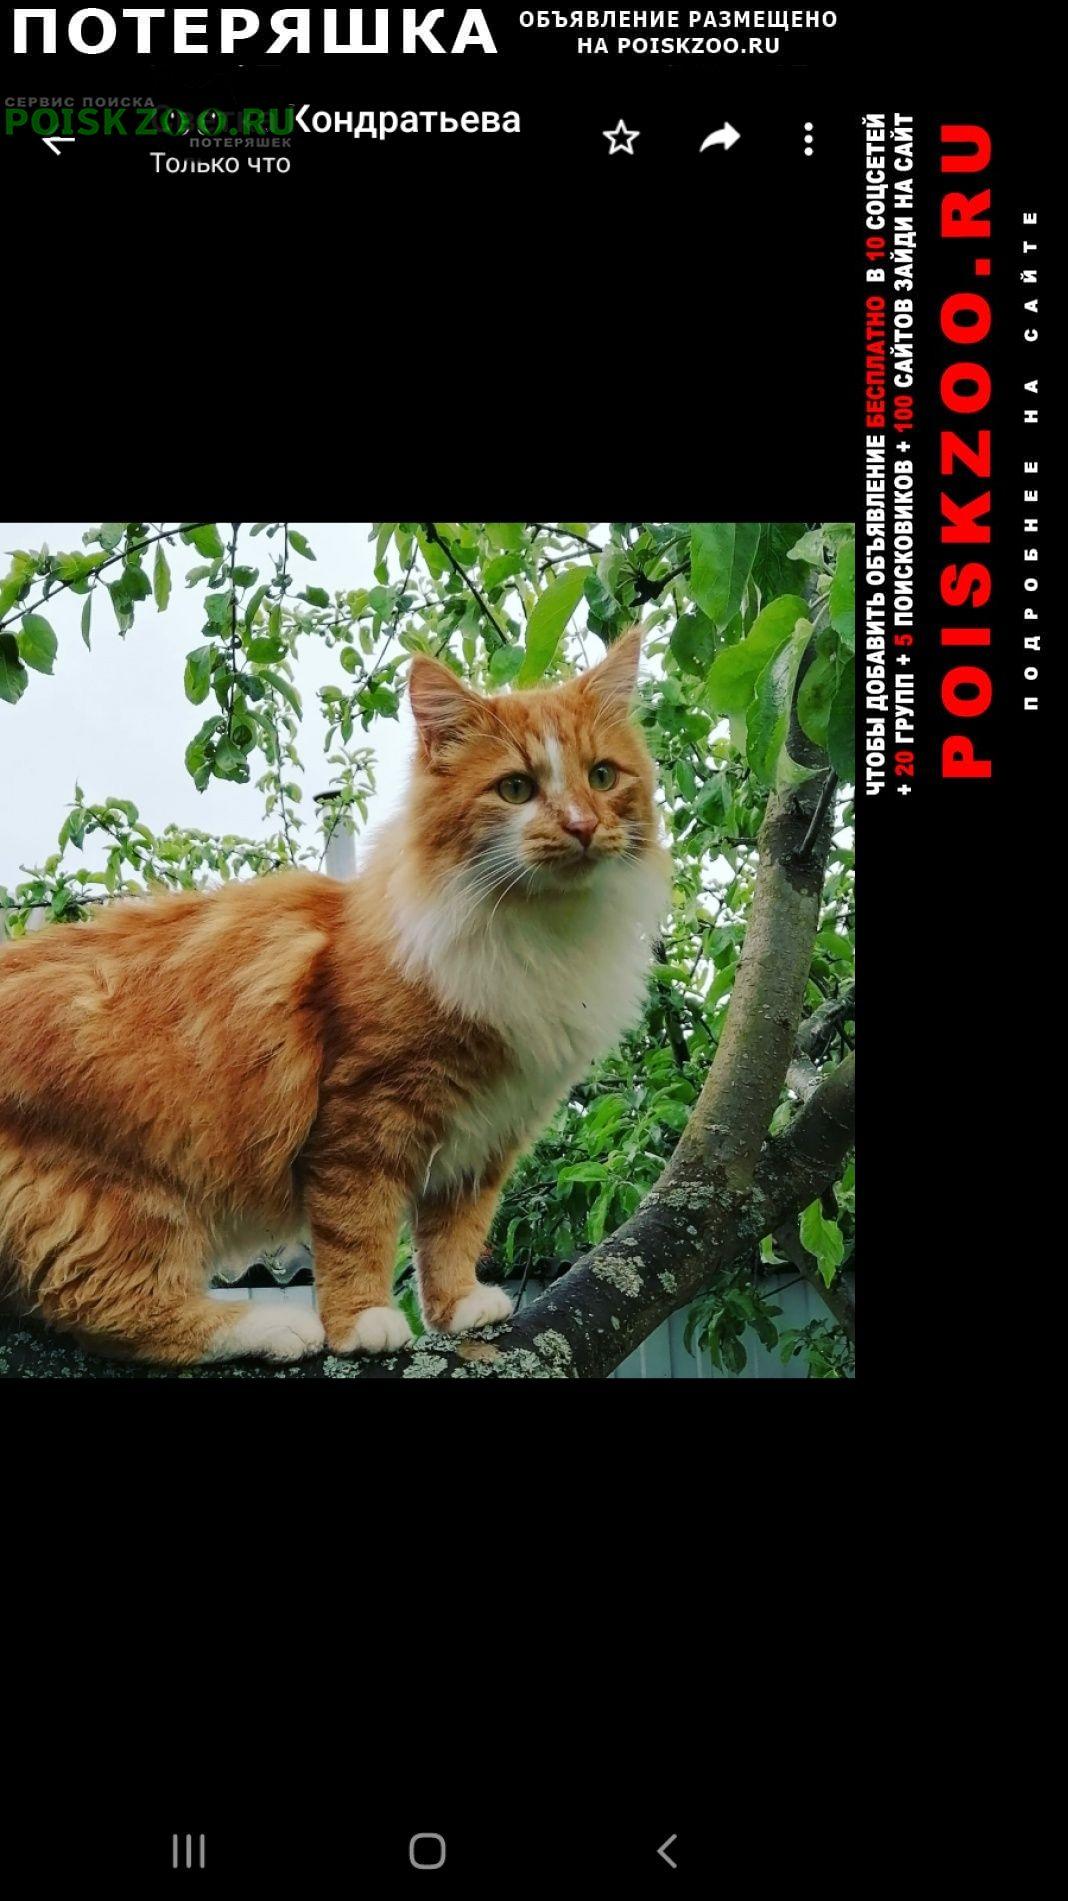 Пропало домашнее животное кот Клин